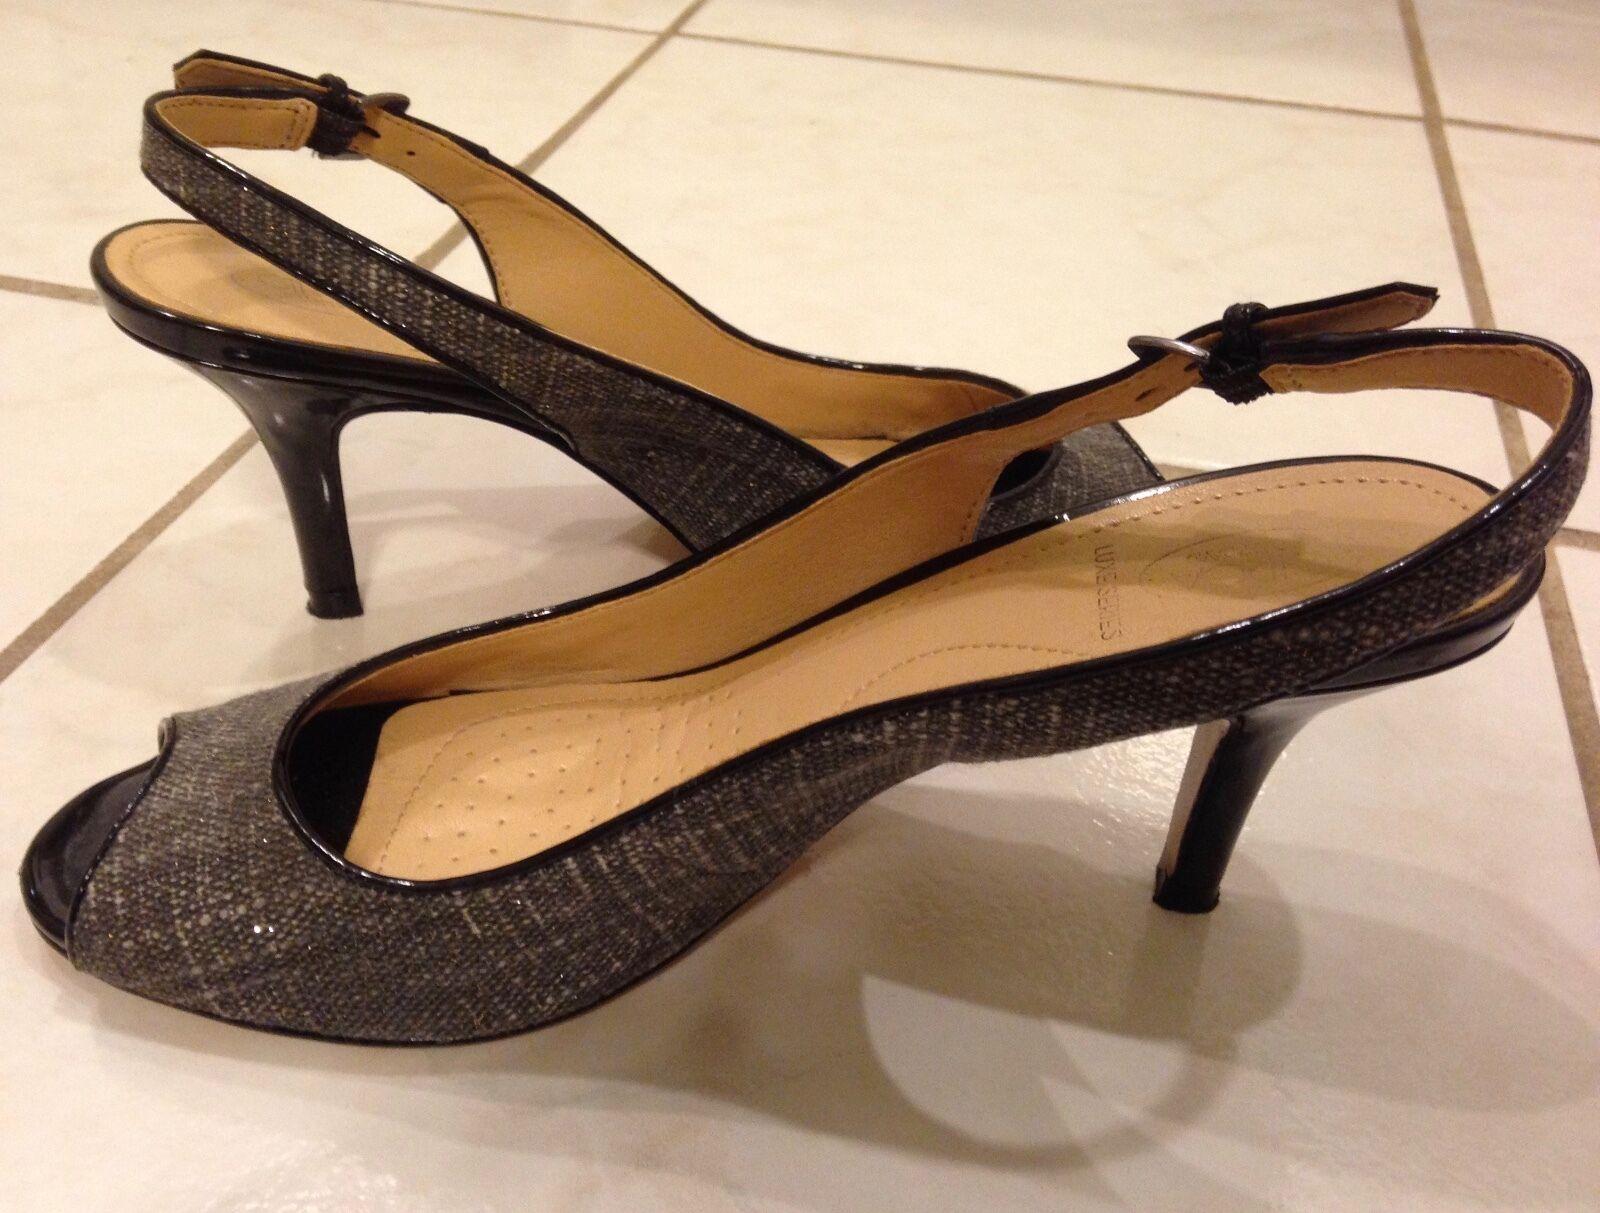 Circa Series Joan & David Luxe Series Circa size 7M dark grey fabric 3 inch slingback heels d71cd5